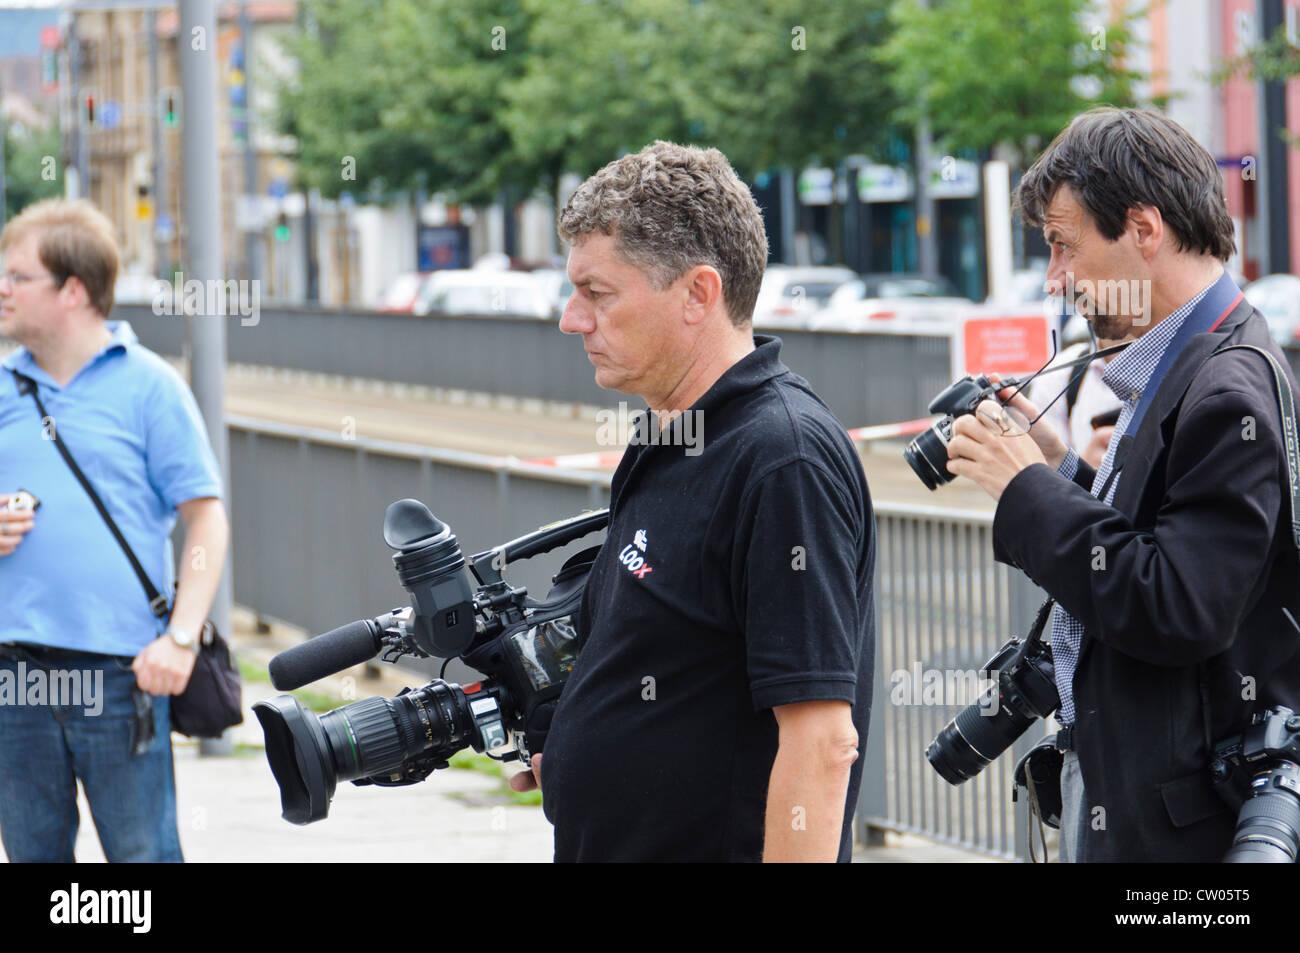 TV Kameramann professioneller Fotograf ENG elektronische Berichterstattung reportage Stockbild